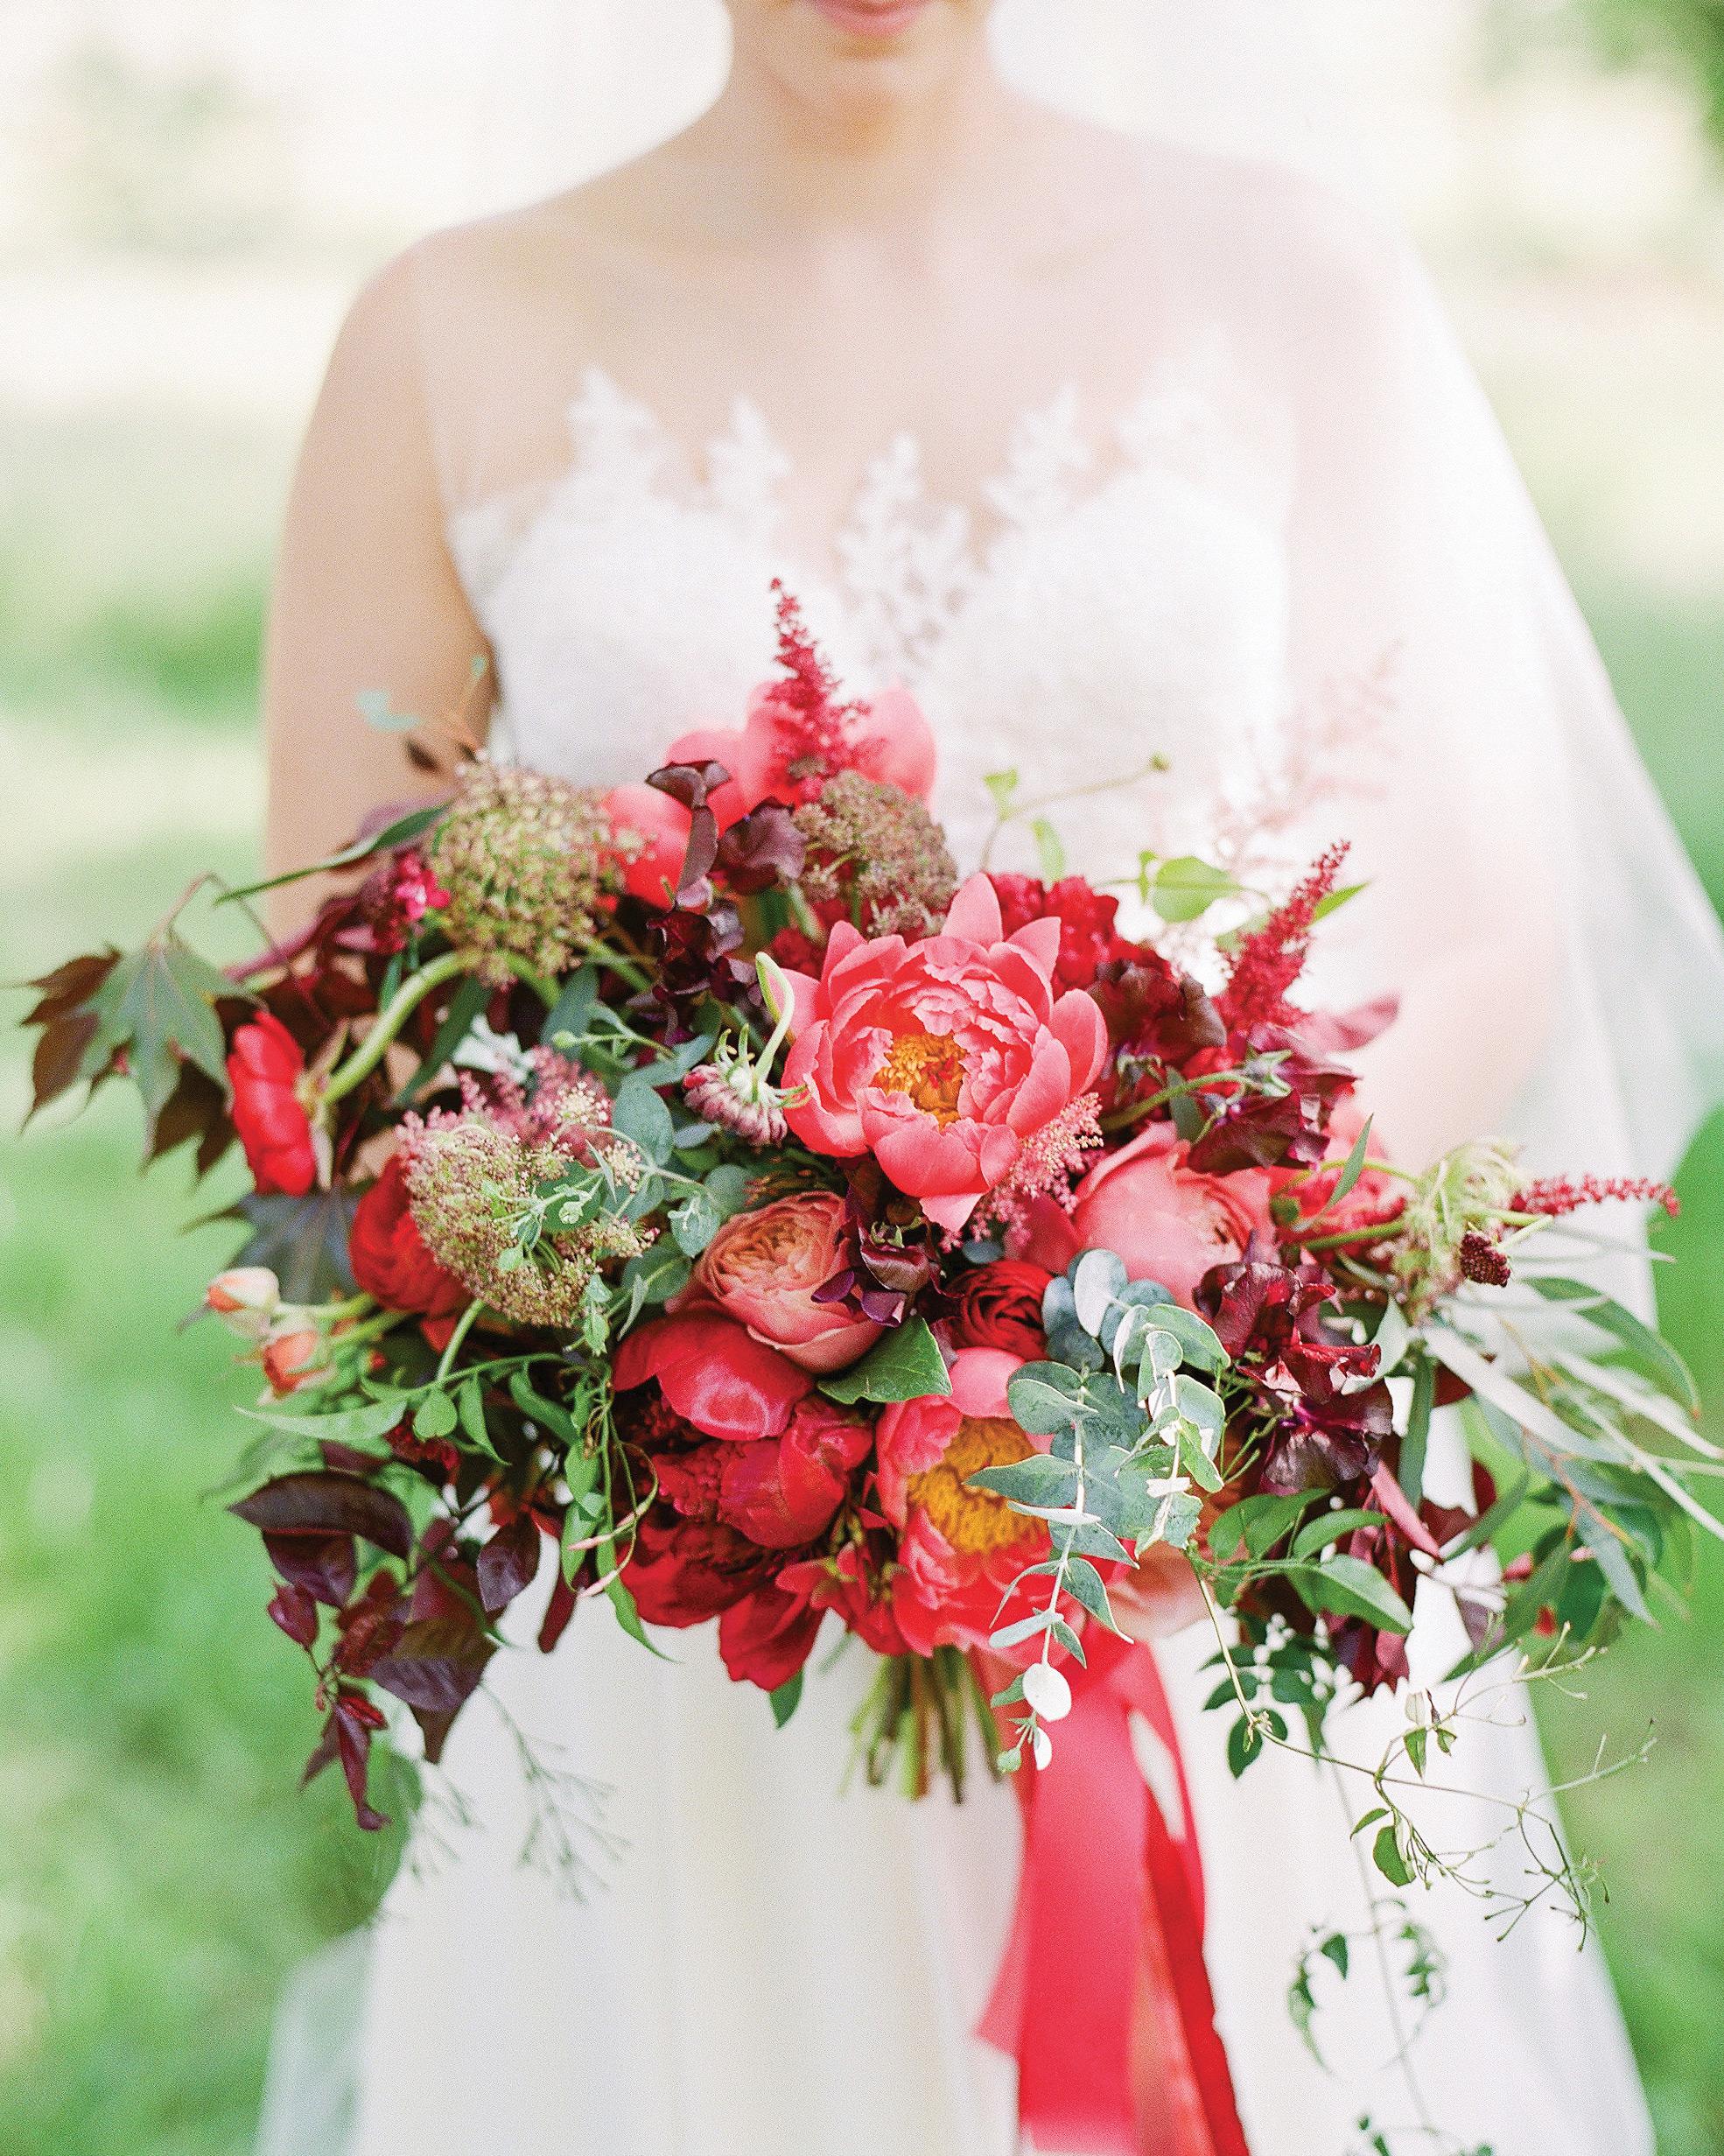 sasha-tyler-wedding-virginia-bridal-bouquet-01-s112867.jpg